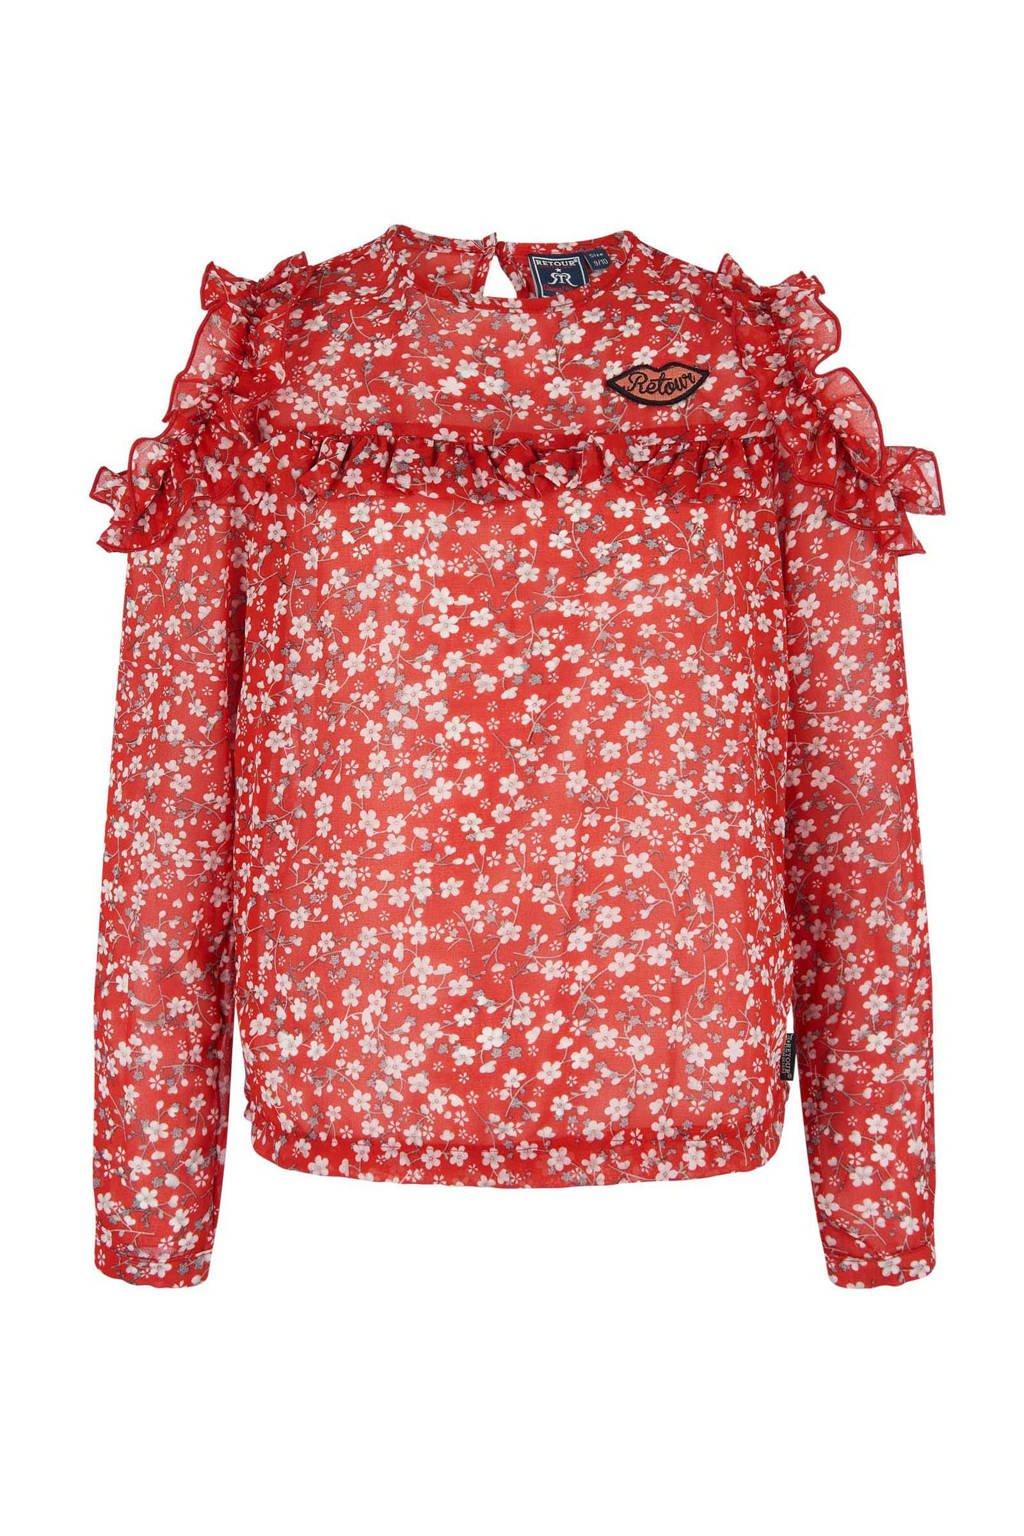 Retour Denim gebloemde top Agatha rood, Rood/wit